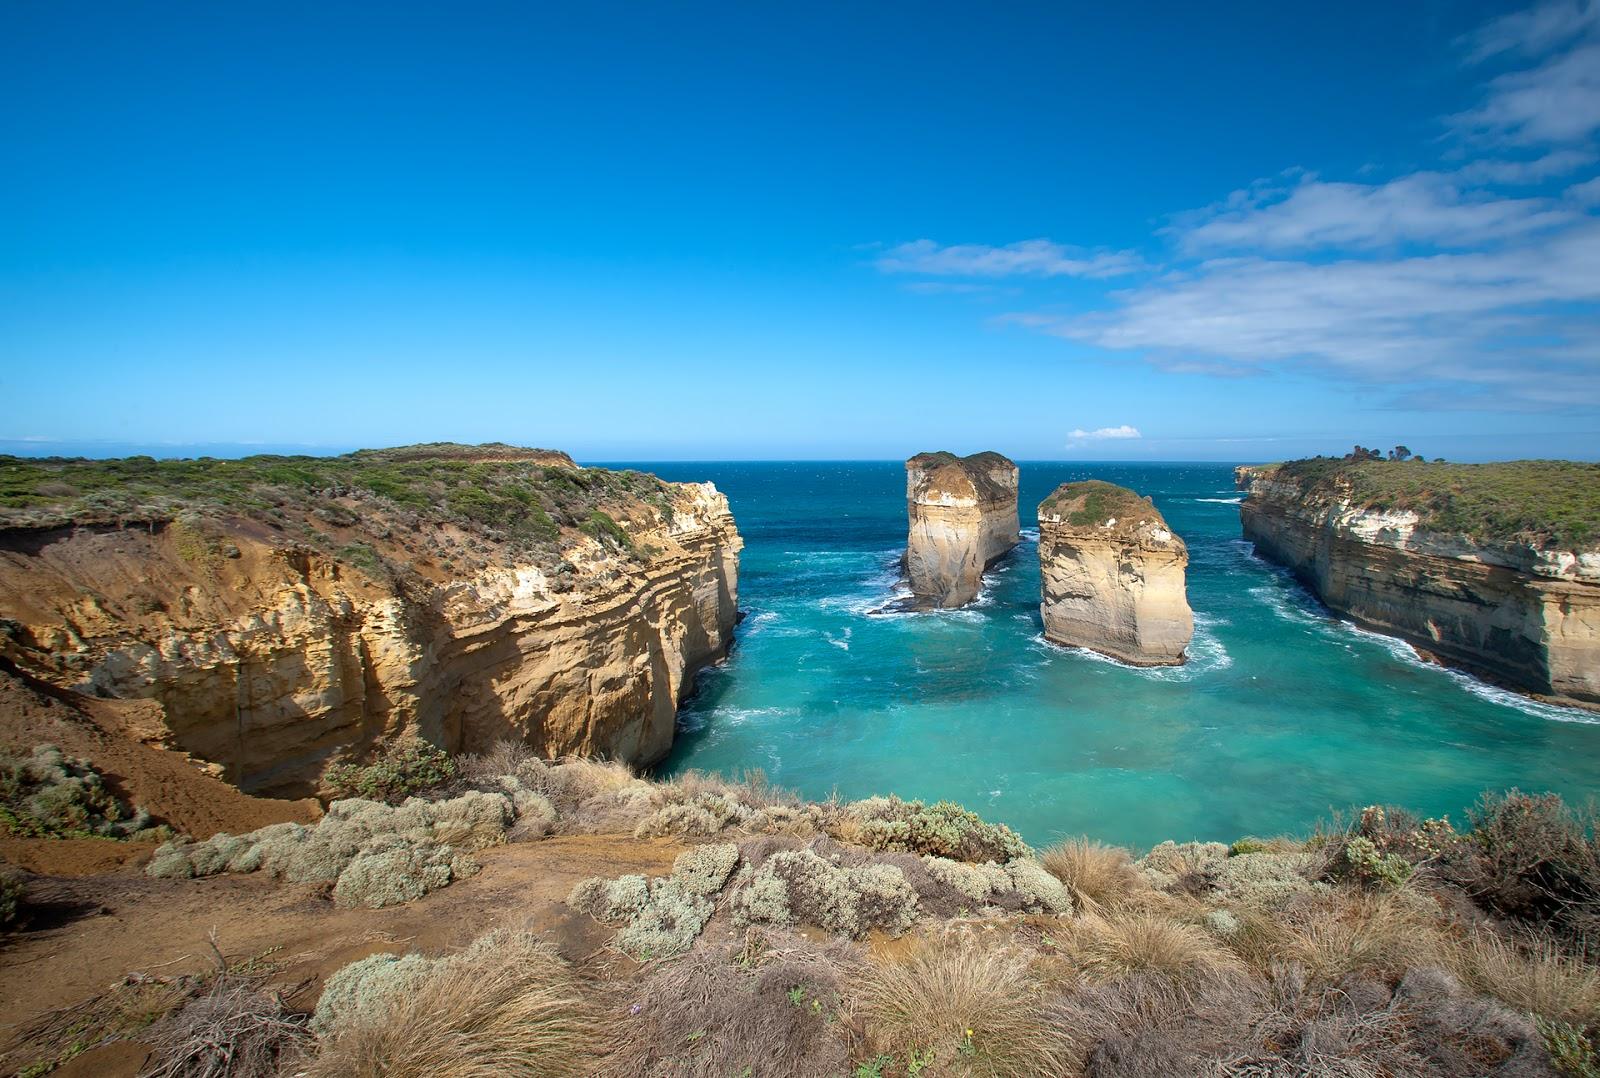 Island Arch,Great Ocean Road,formacje skalne